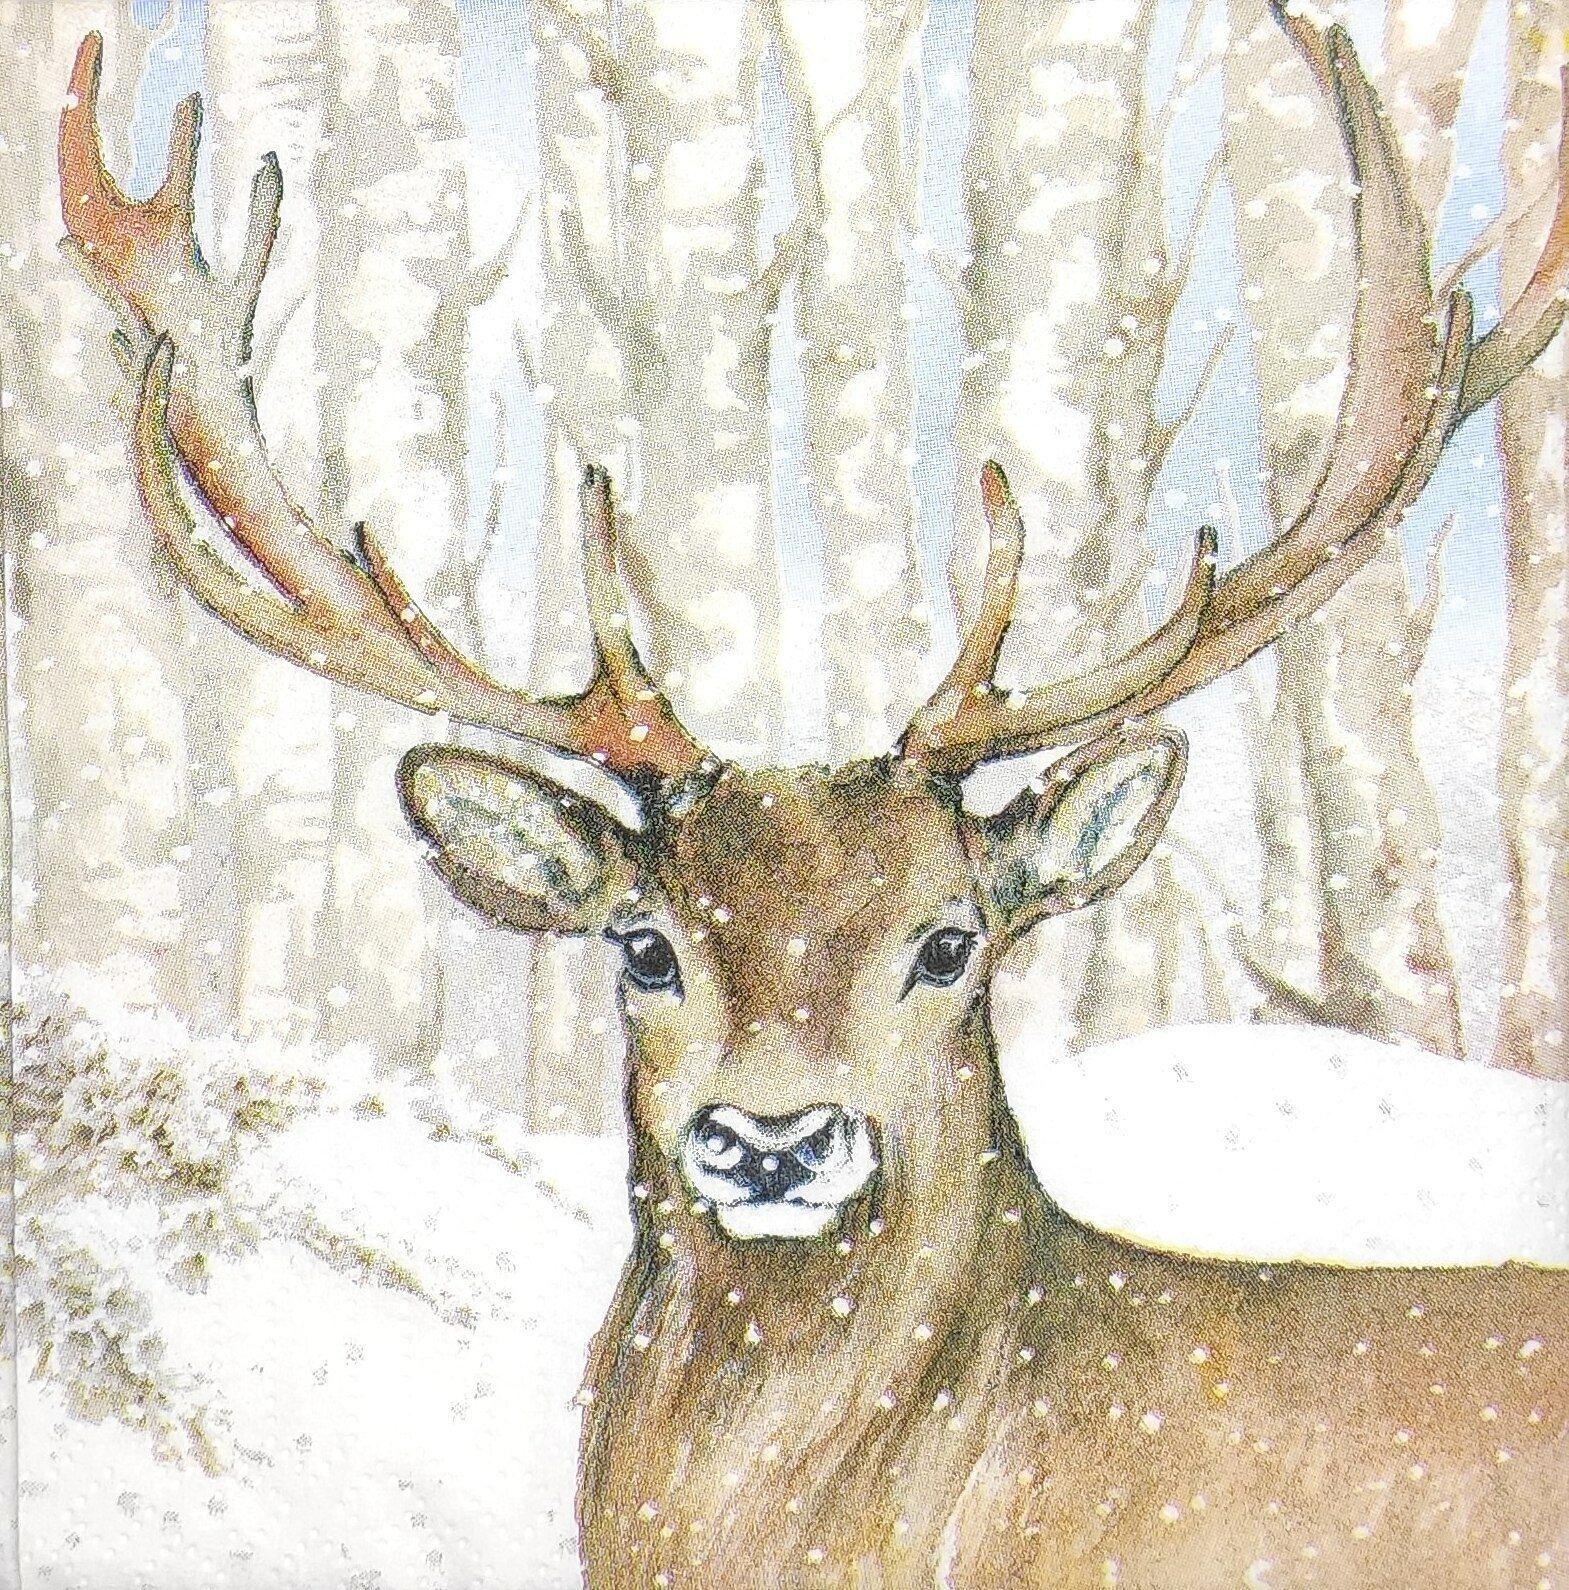 4x Paper Napkins for Decoupage Decopatch Craft Regalia Deer